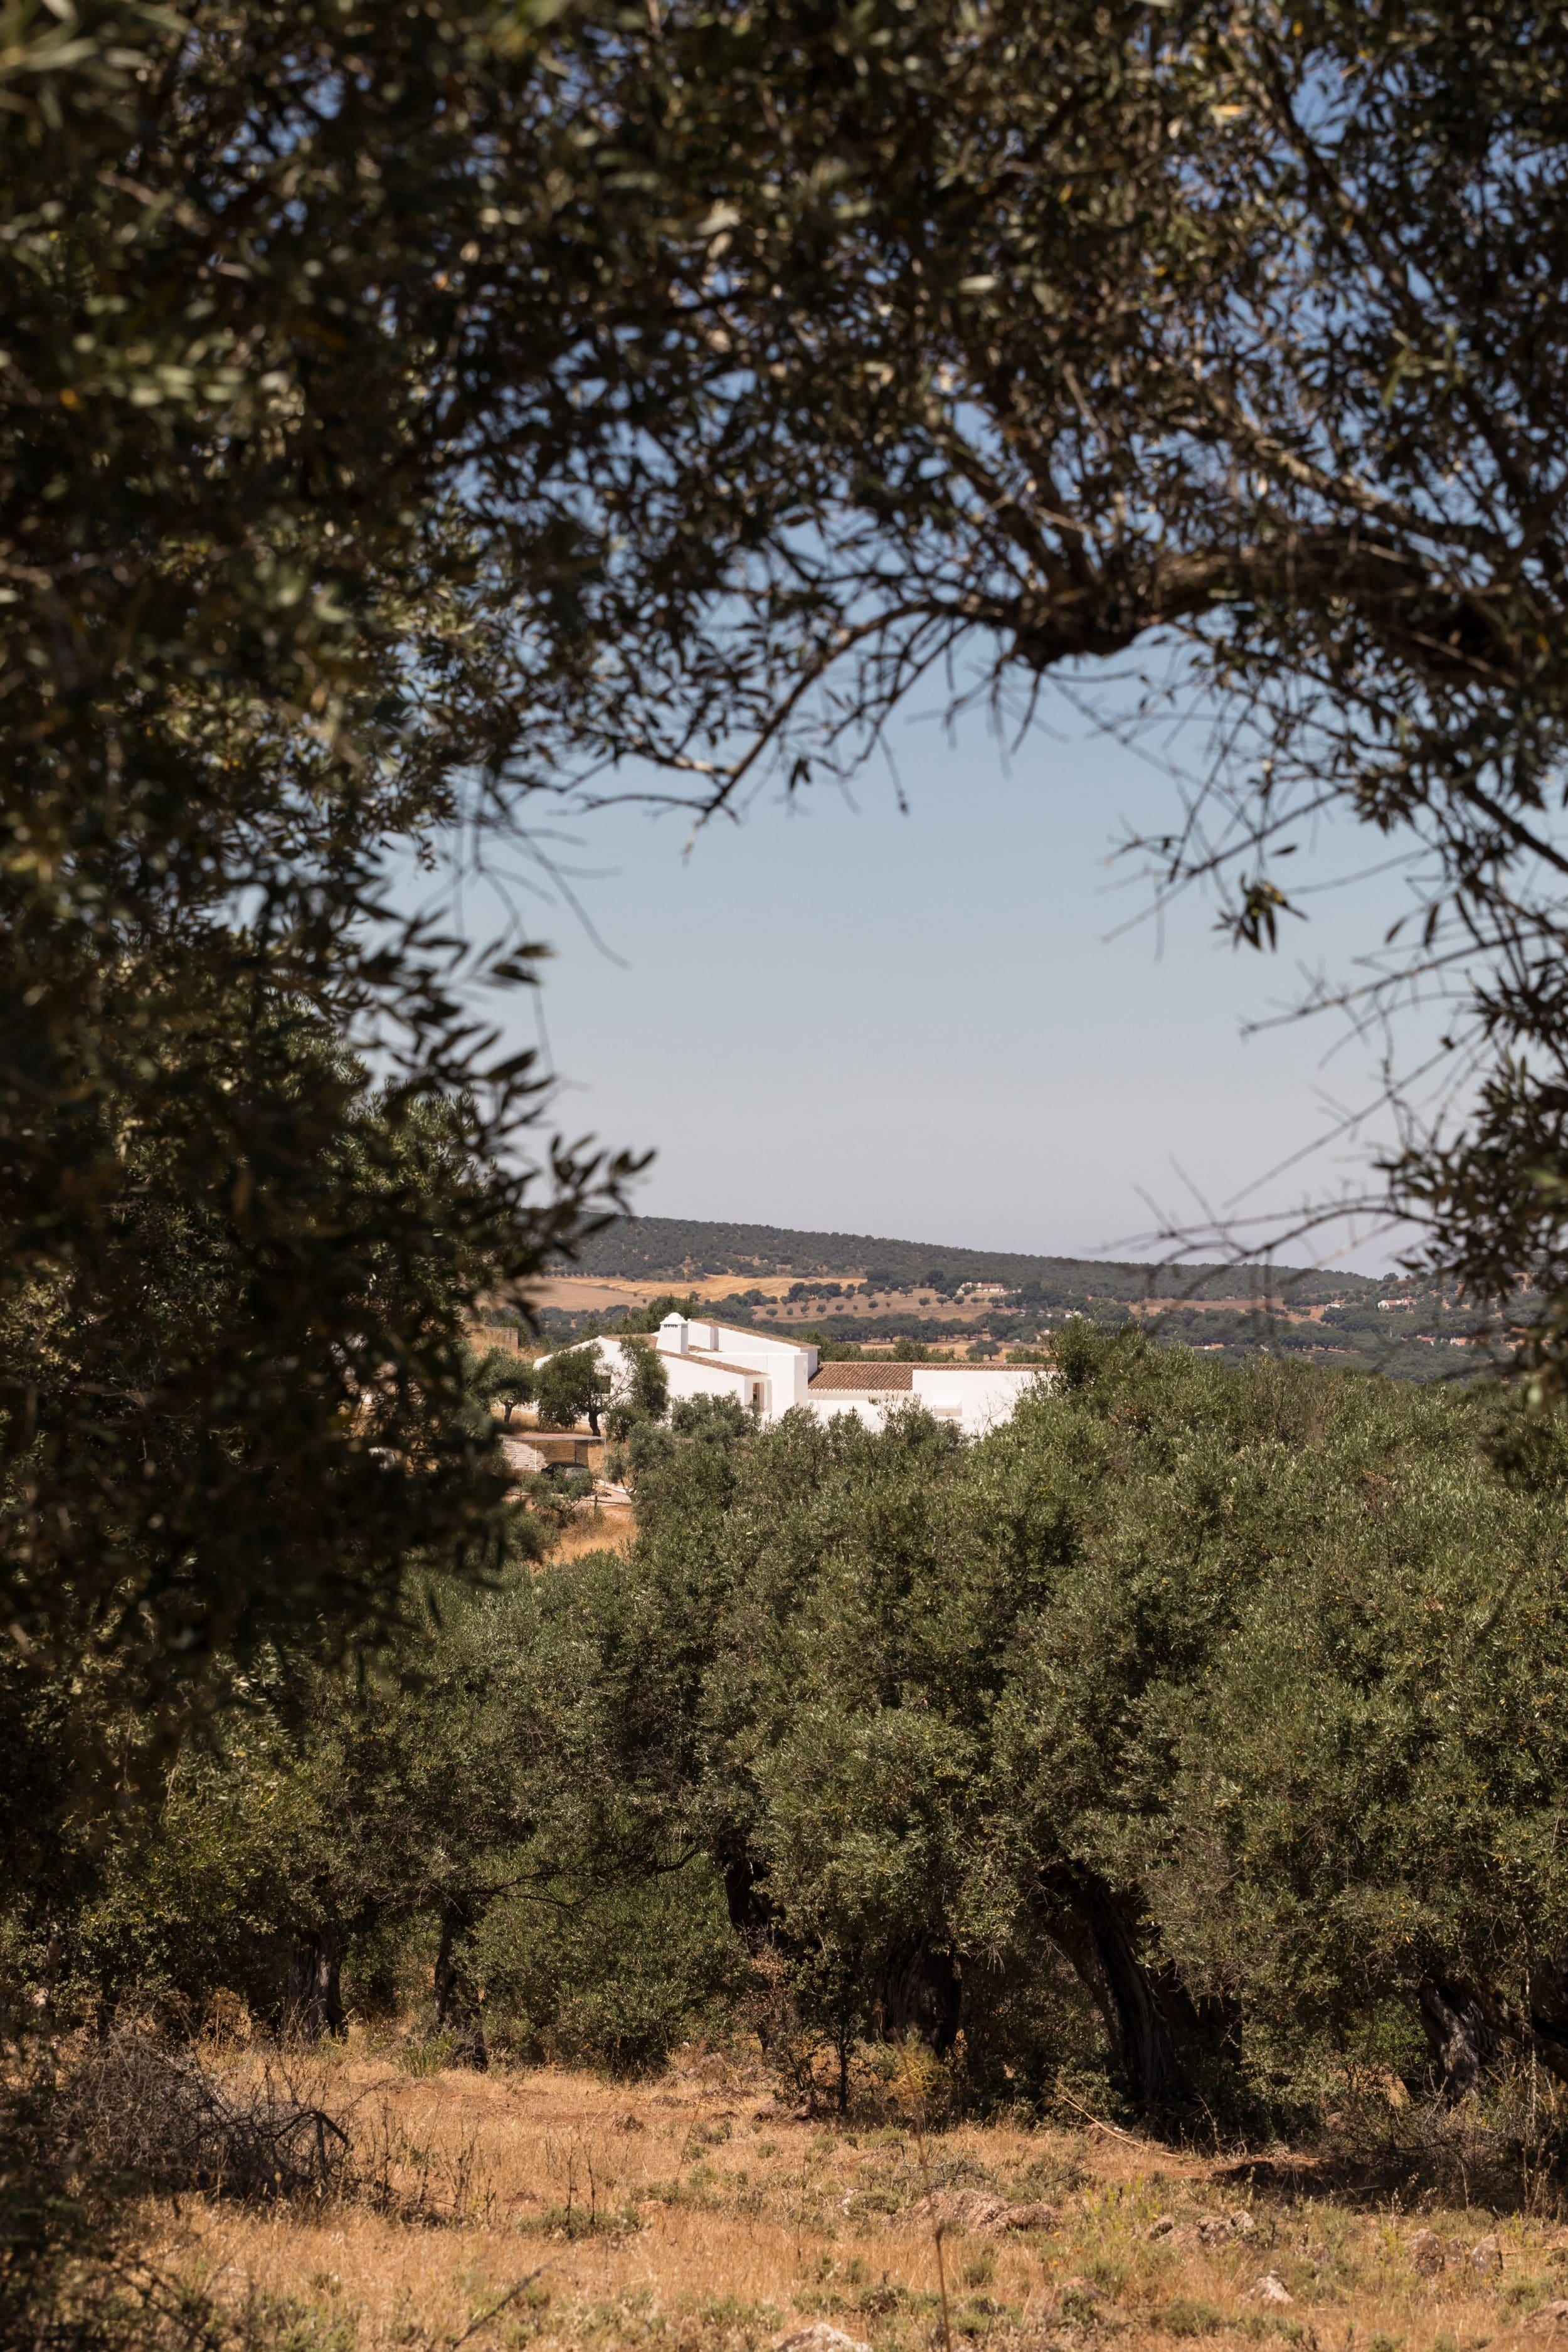 Dalicenca view trees